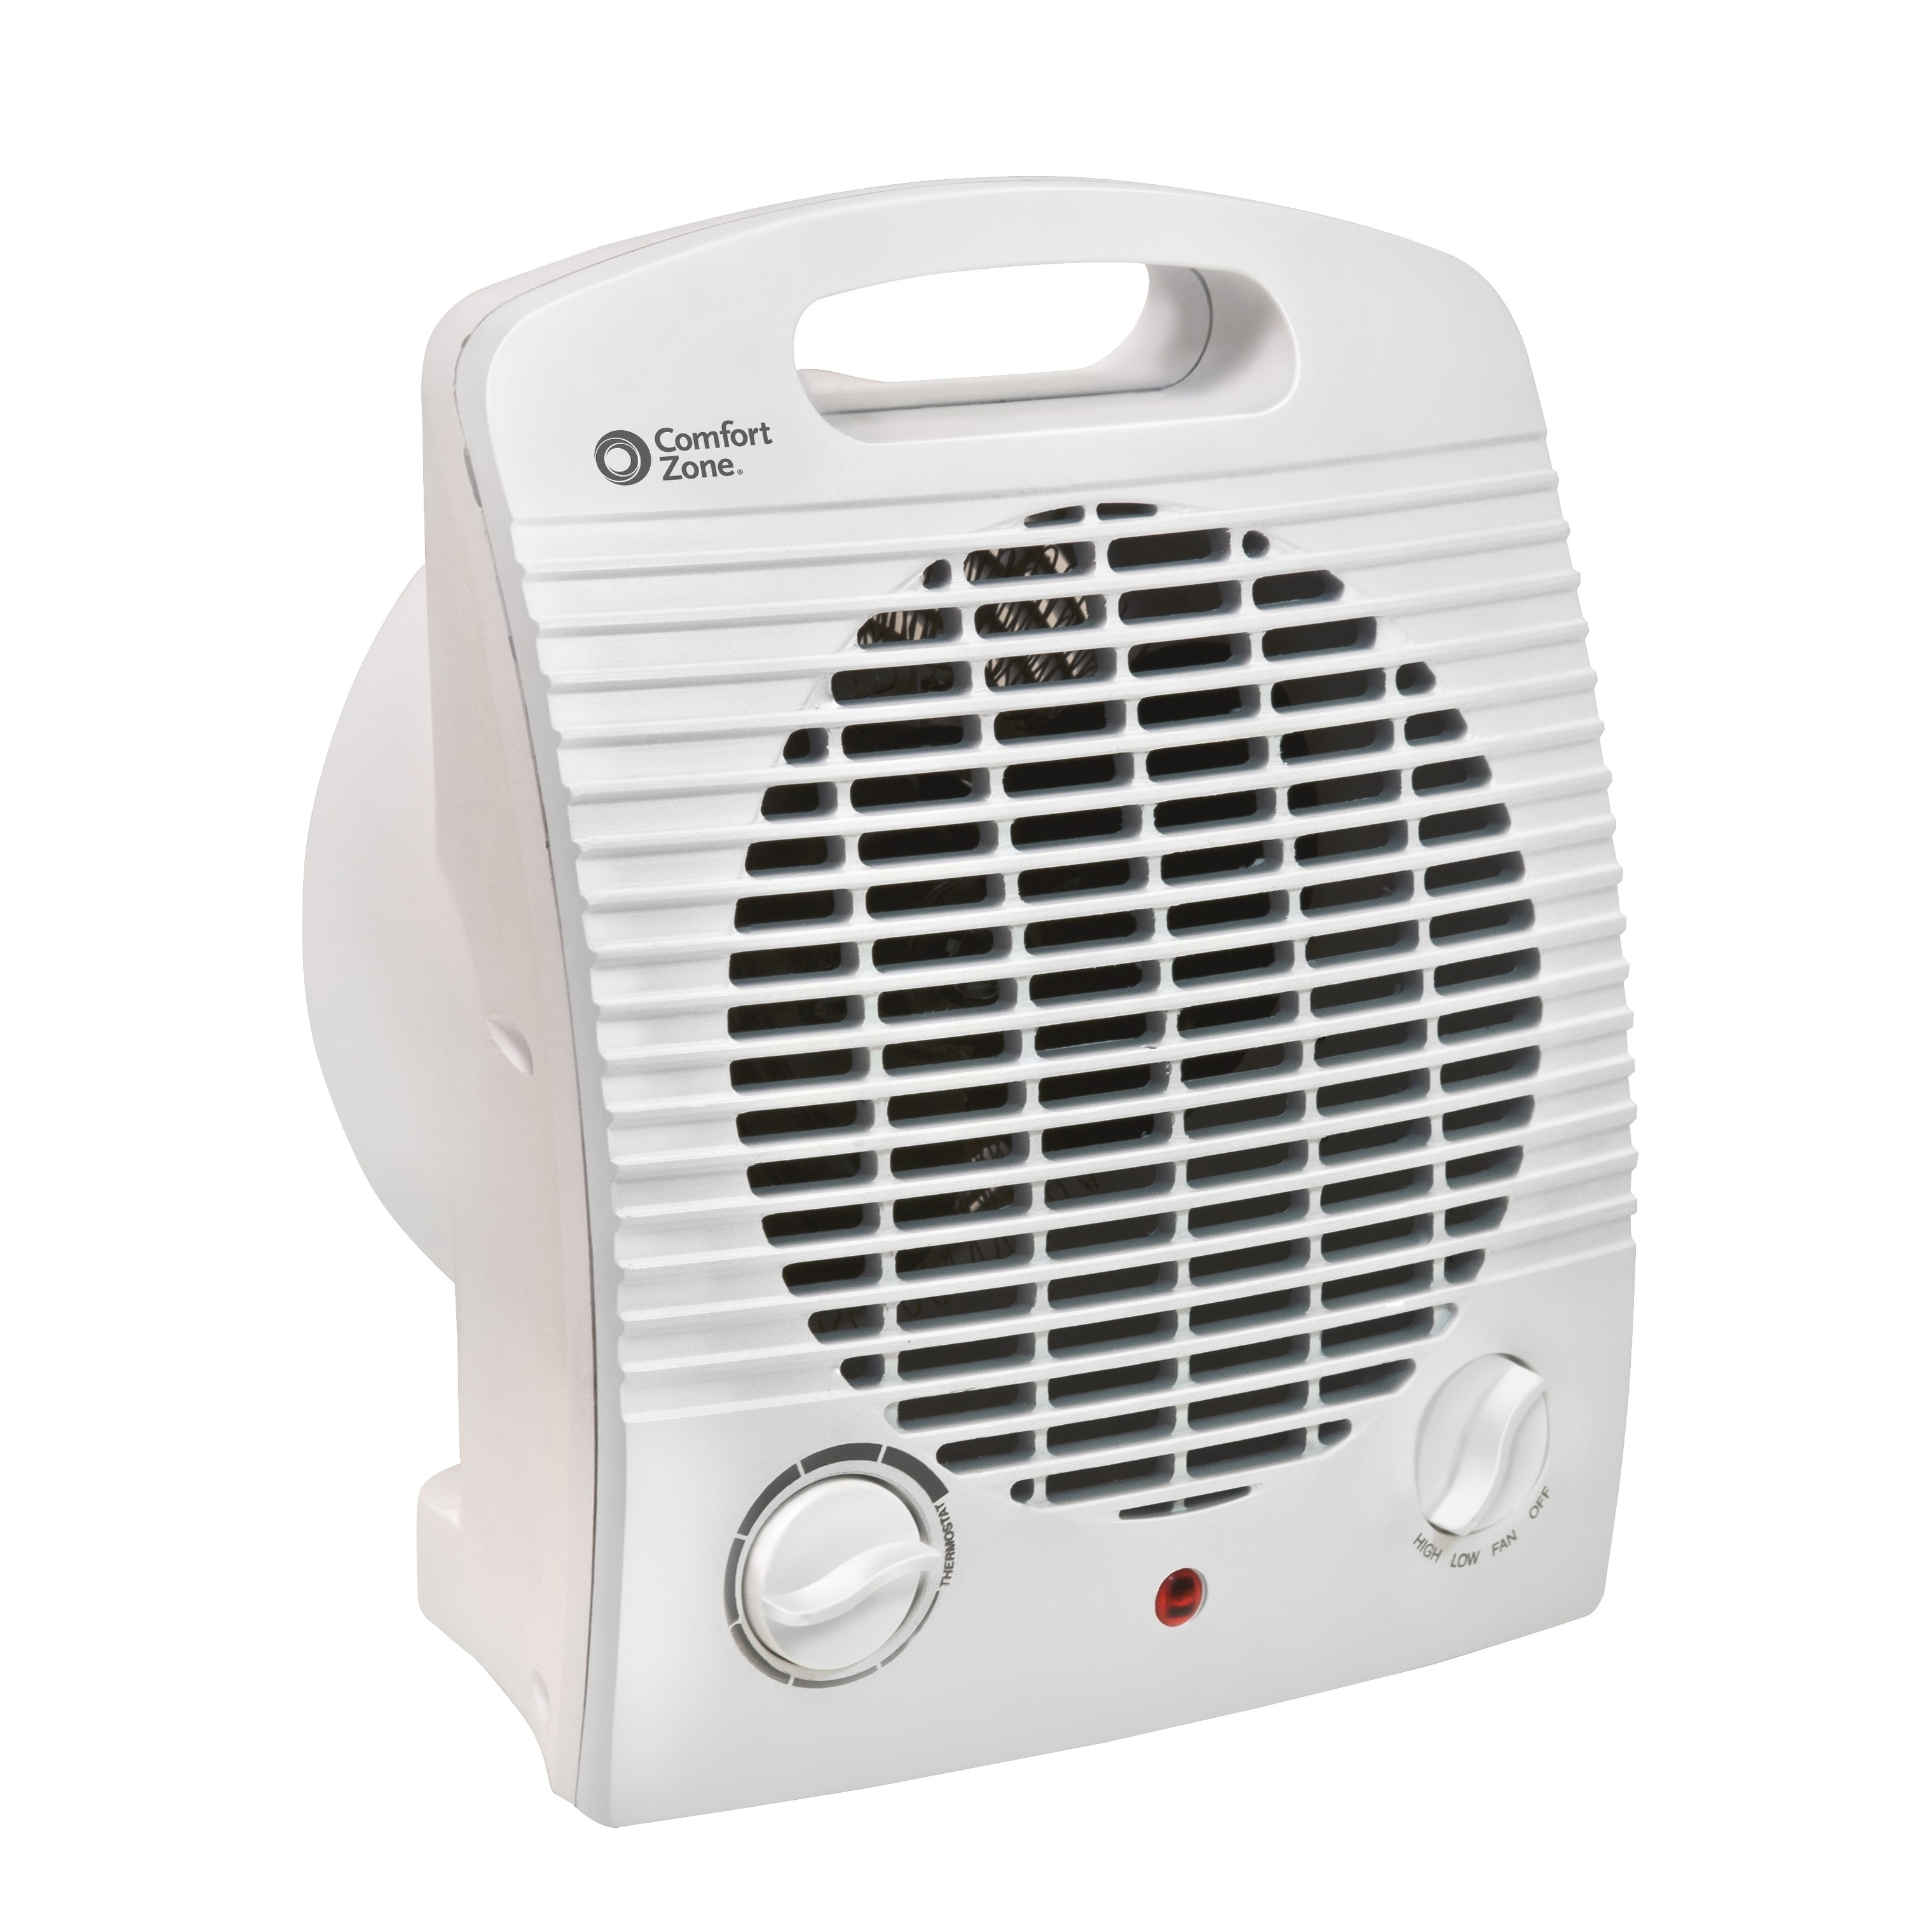 Comfort Glow Infrared Quartz Wall Heater 1500 Watt w// Stay Cool Cabinet and Fan